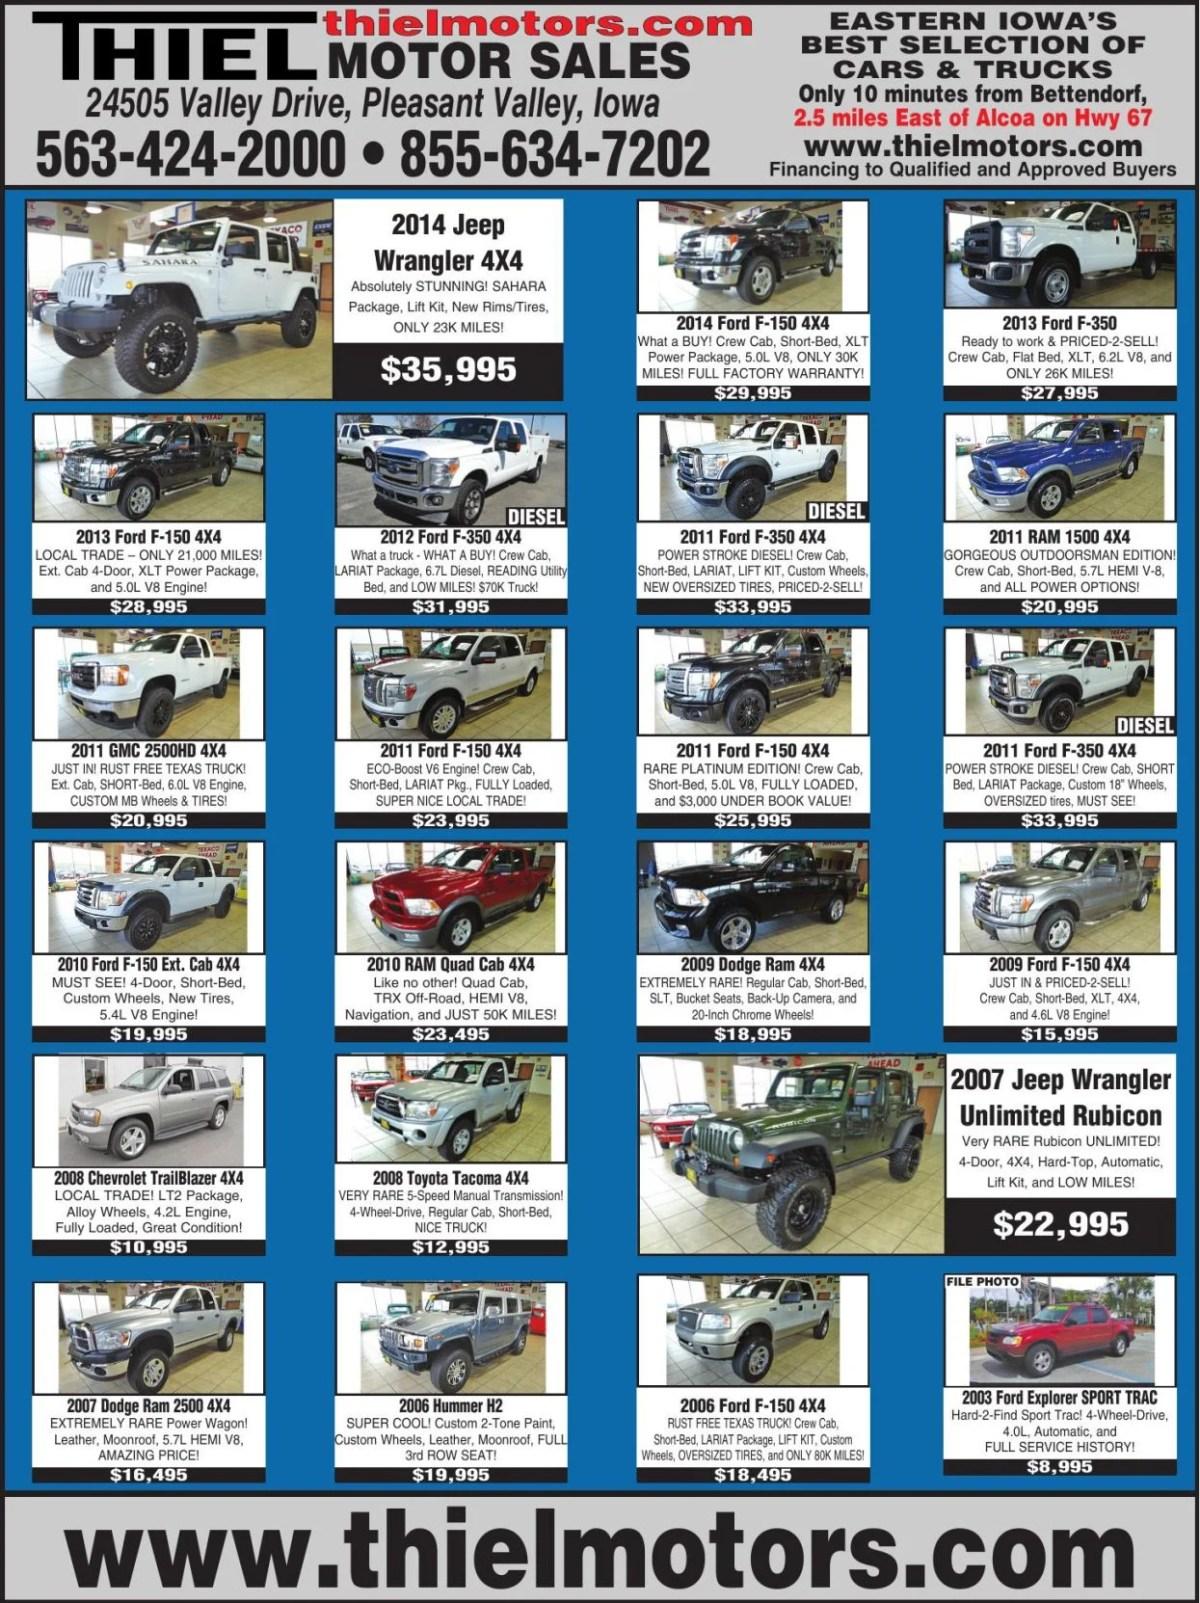 2006 Ford F 150 Transmission 4 Speed Automatic : transmission, speed, automatic, 20680568.pdf, Vault, Qctimes.com